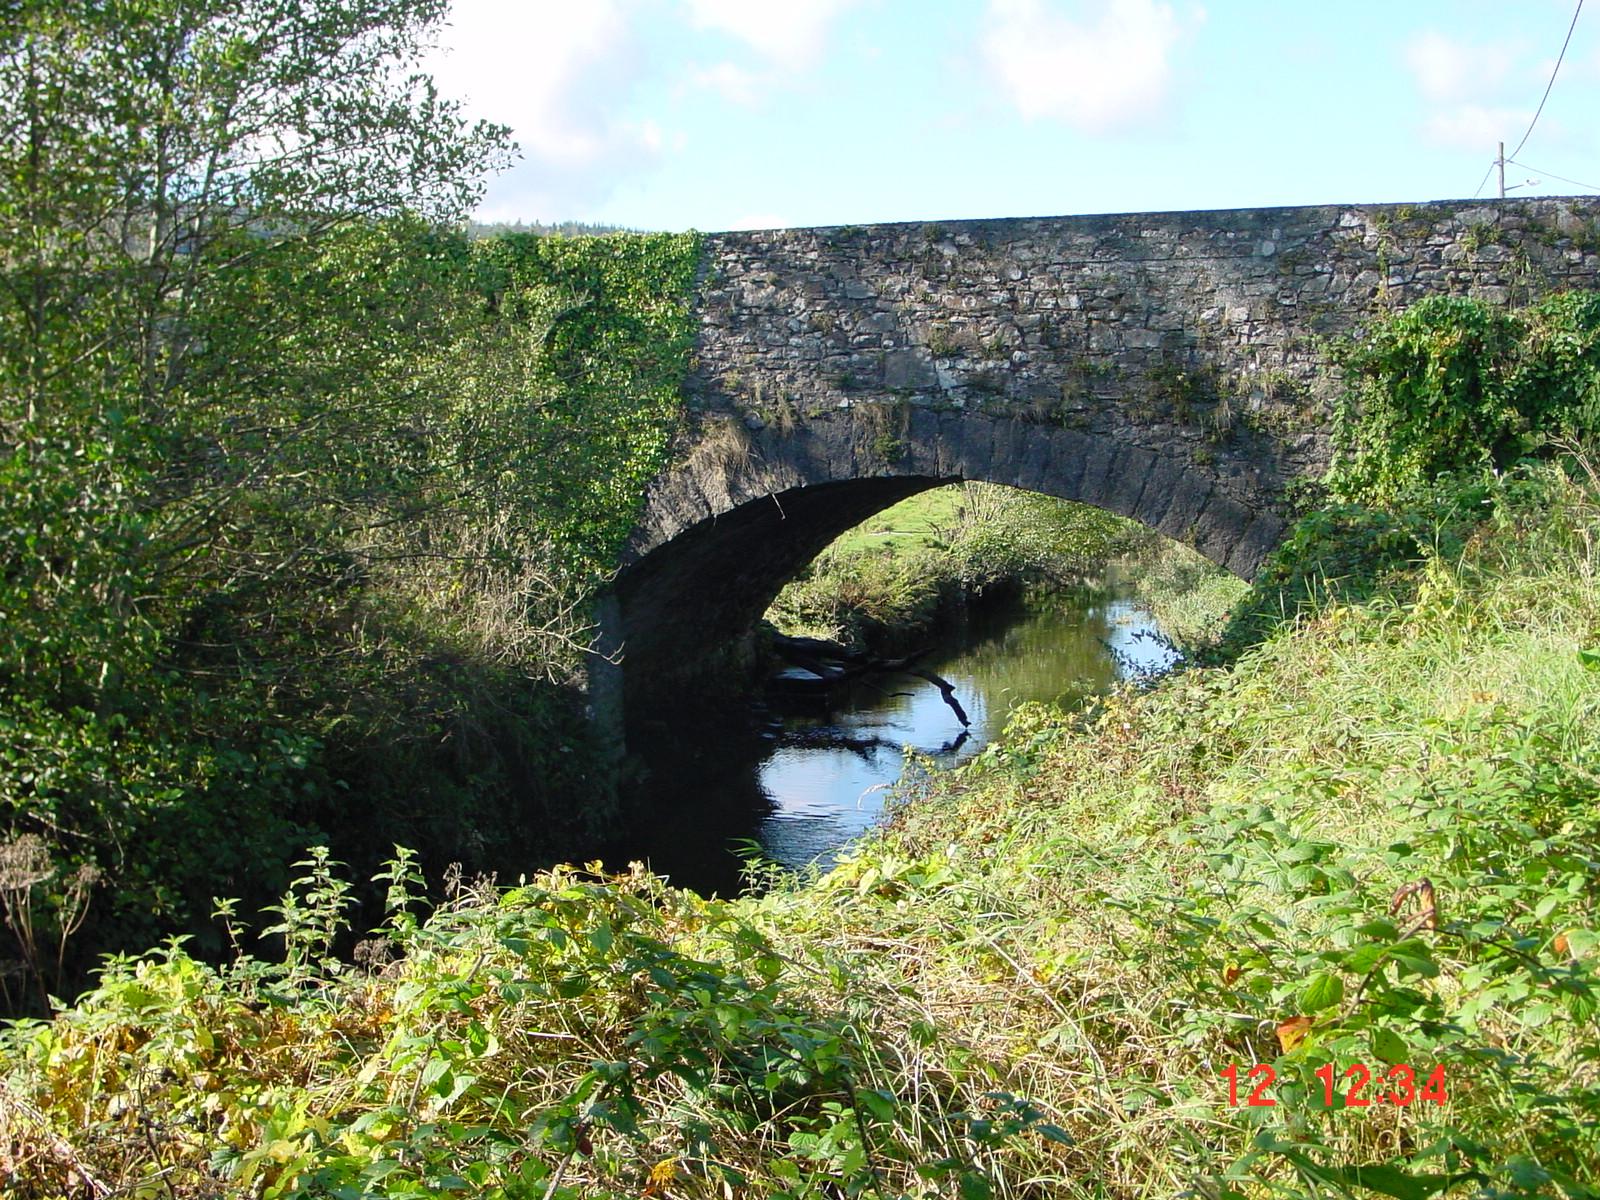 The road-bridge at Portlaw